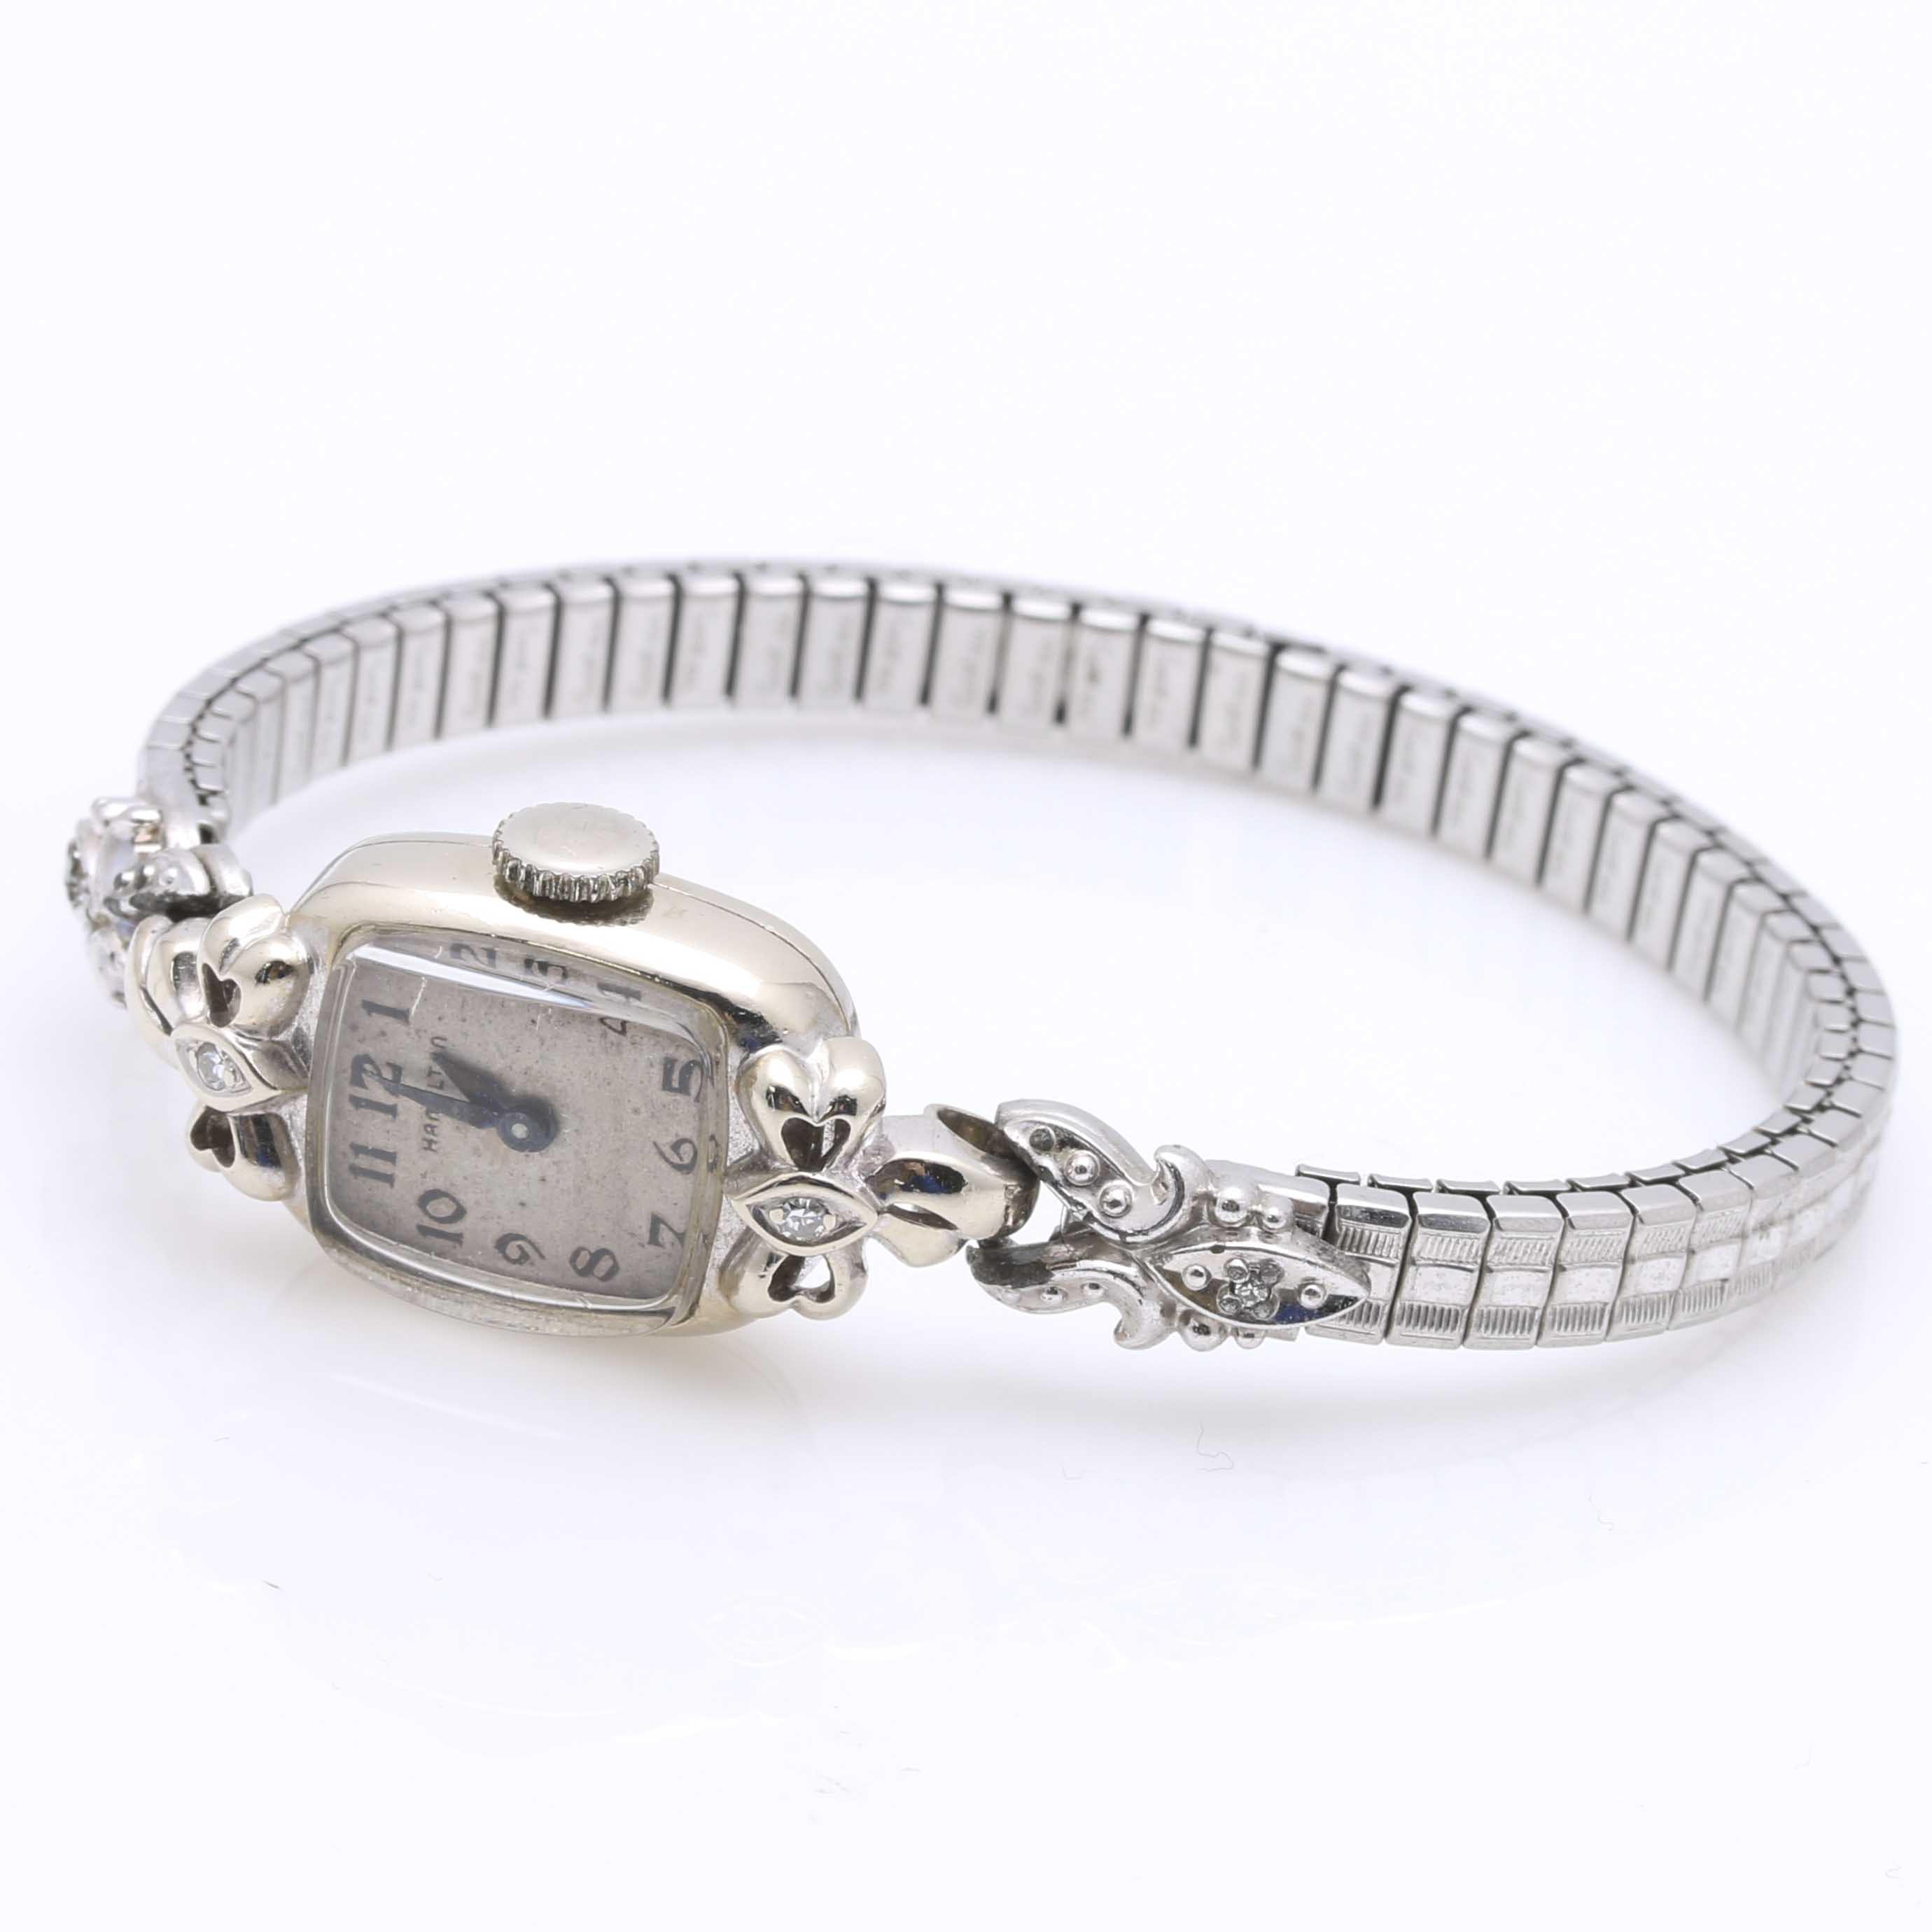 14K White Gold Hamilton Women's Diamond Wristwatch